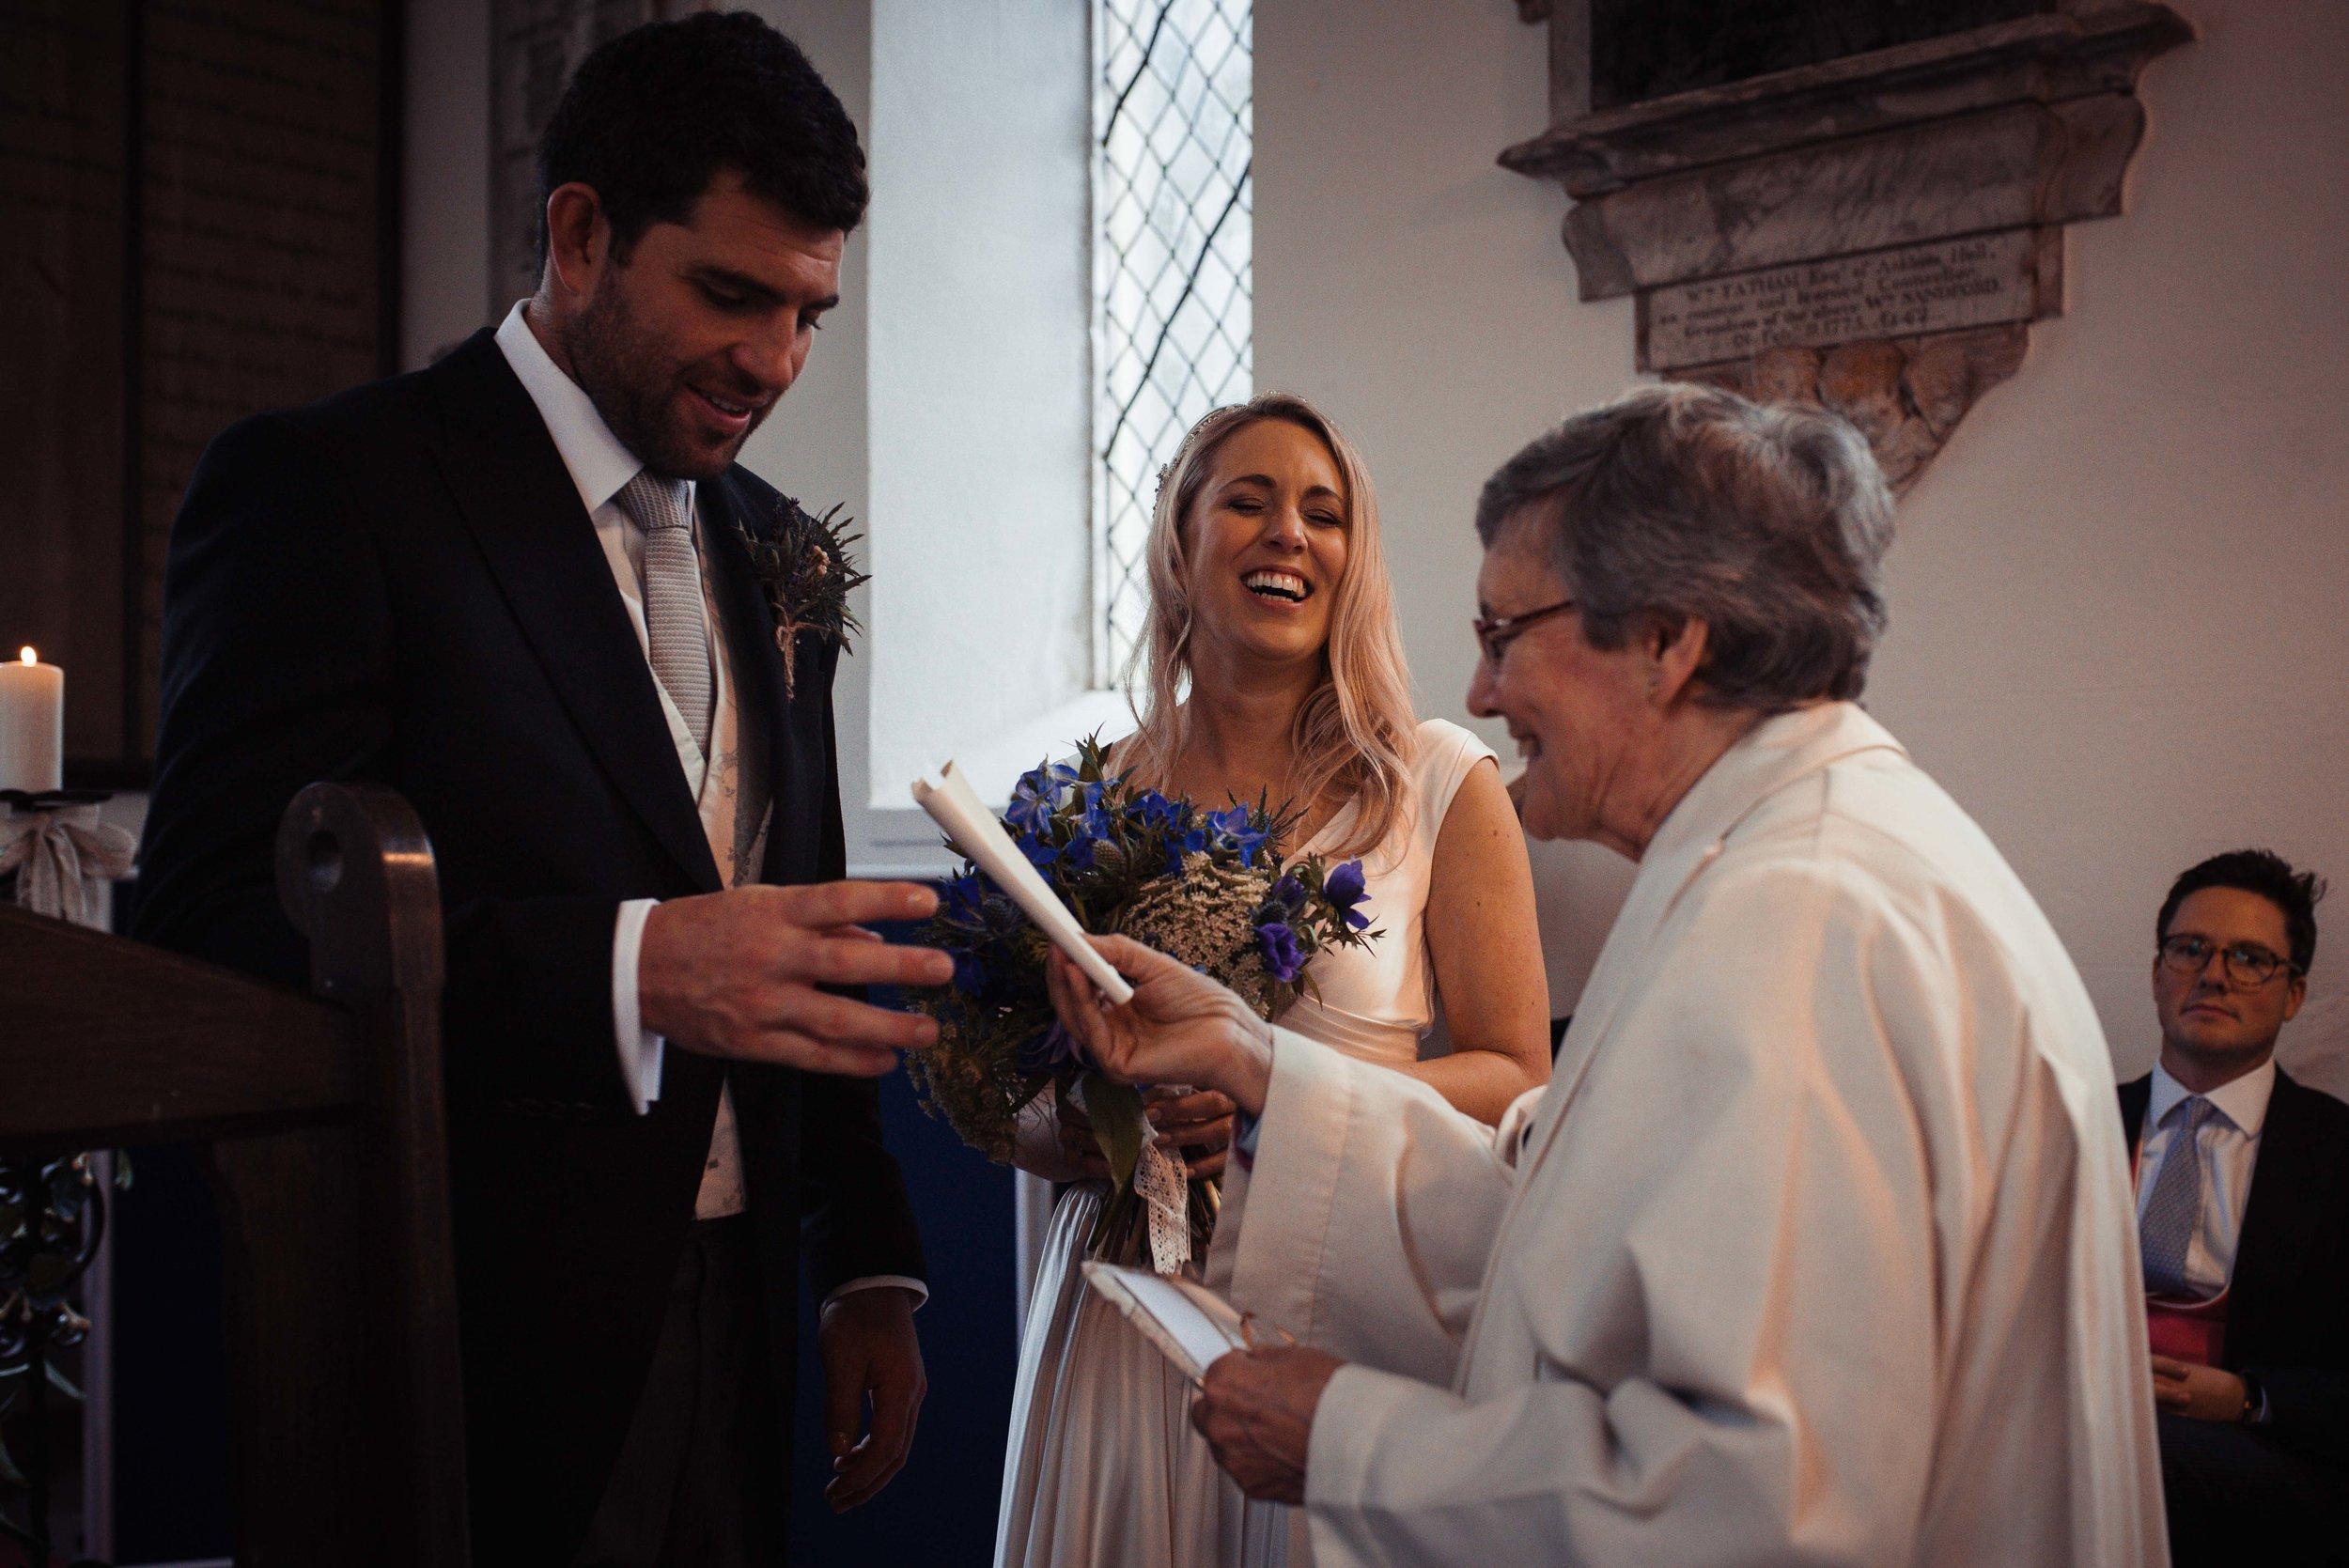 Askham-Hall-Wedding-Photography-32.jpg